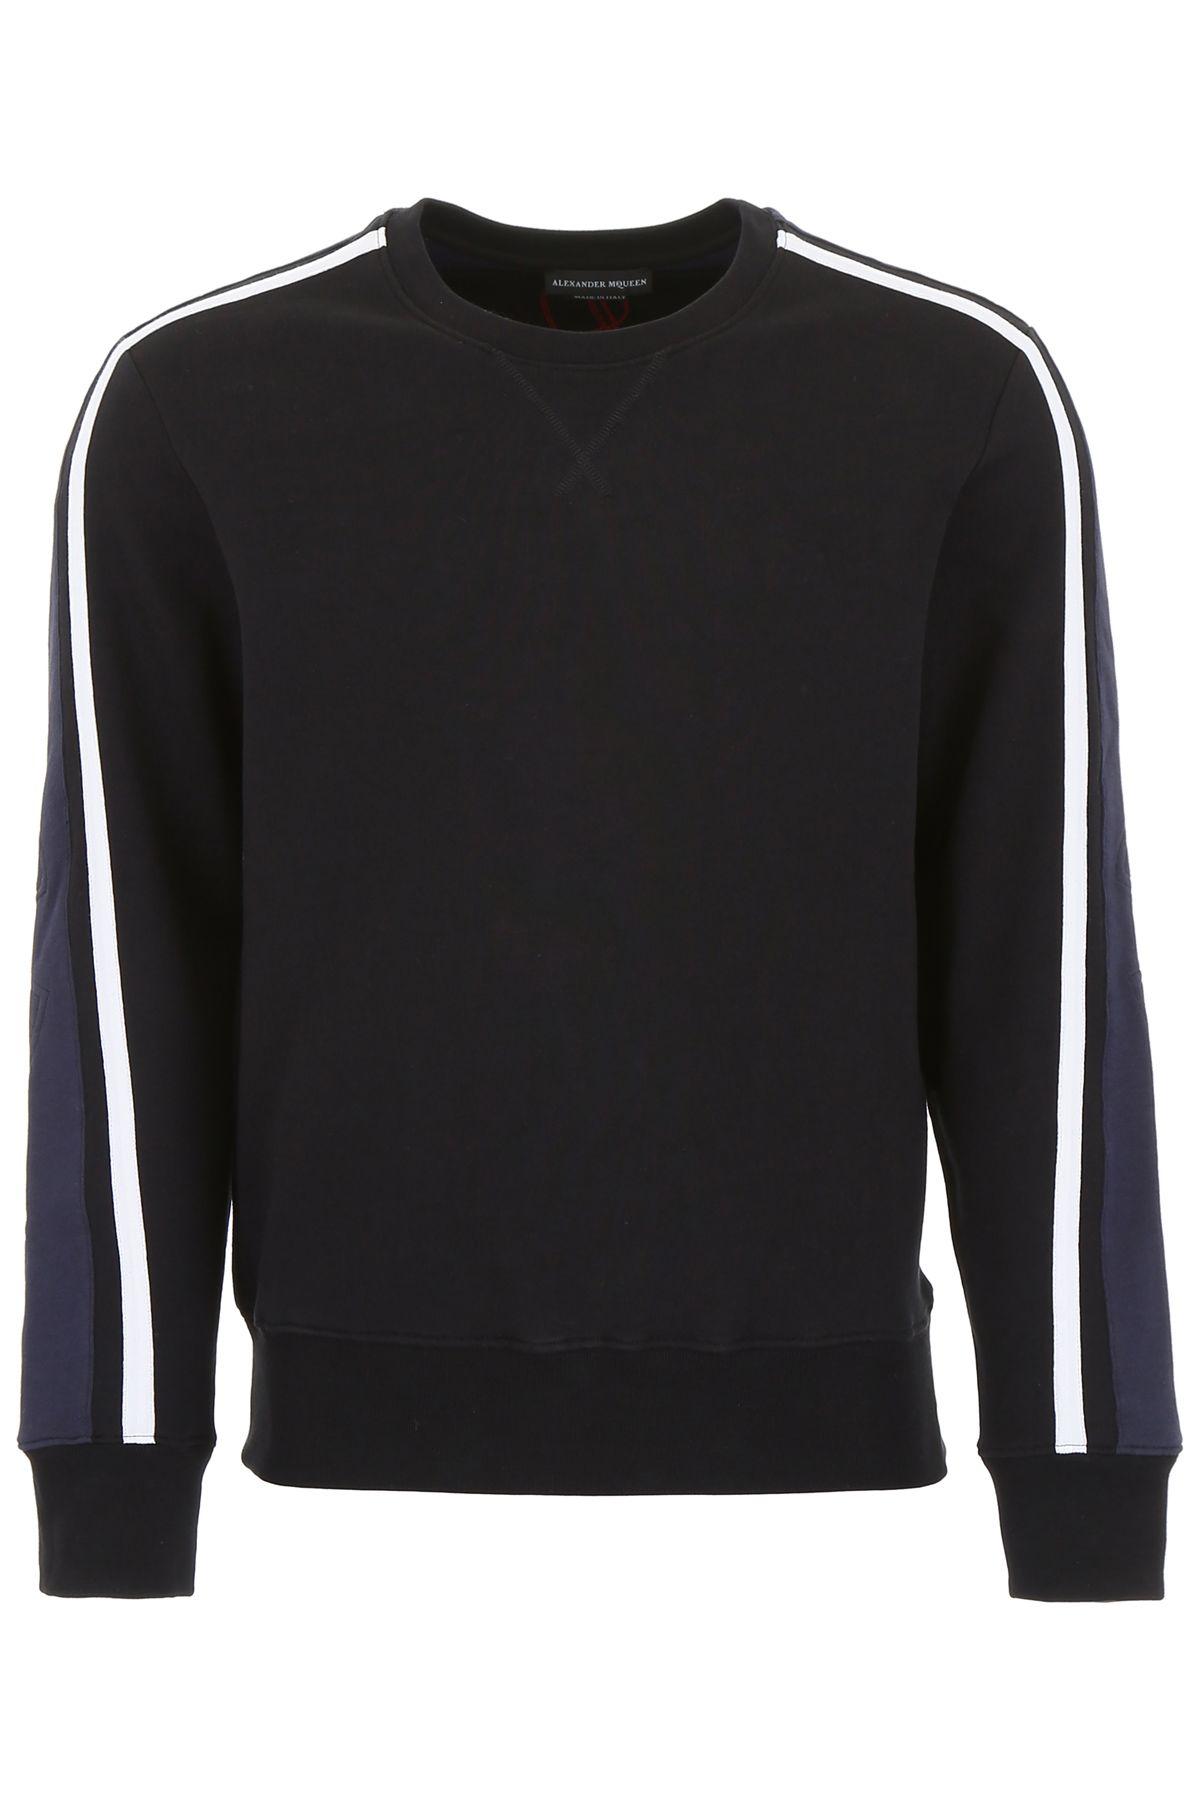 Alexander McQueen Sweatshirt With Embroidered Logo